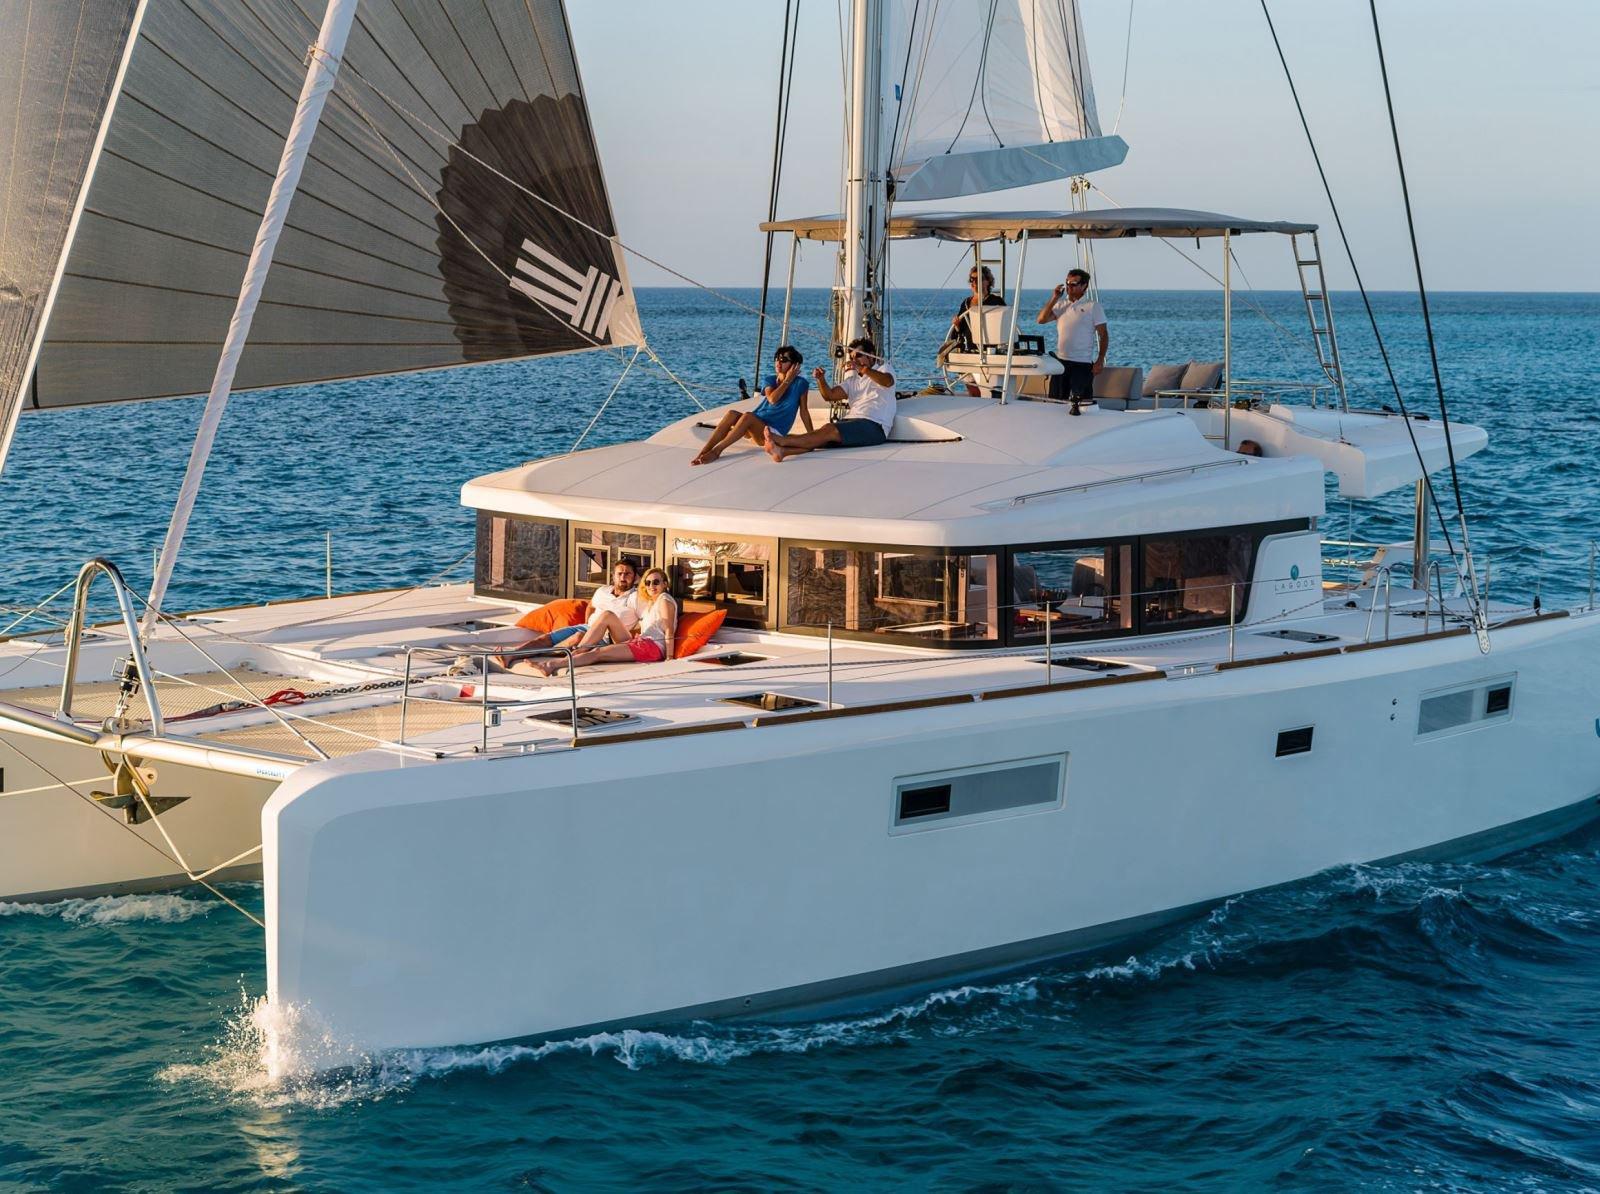 Noleggio Barca Vela con Skipper